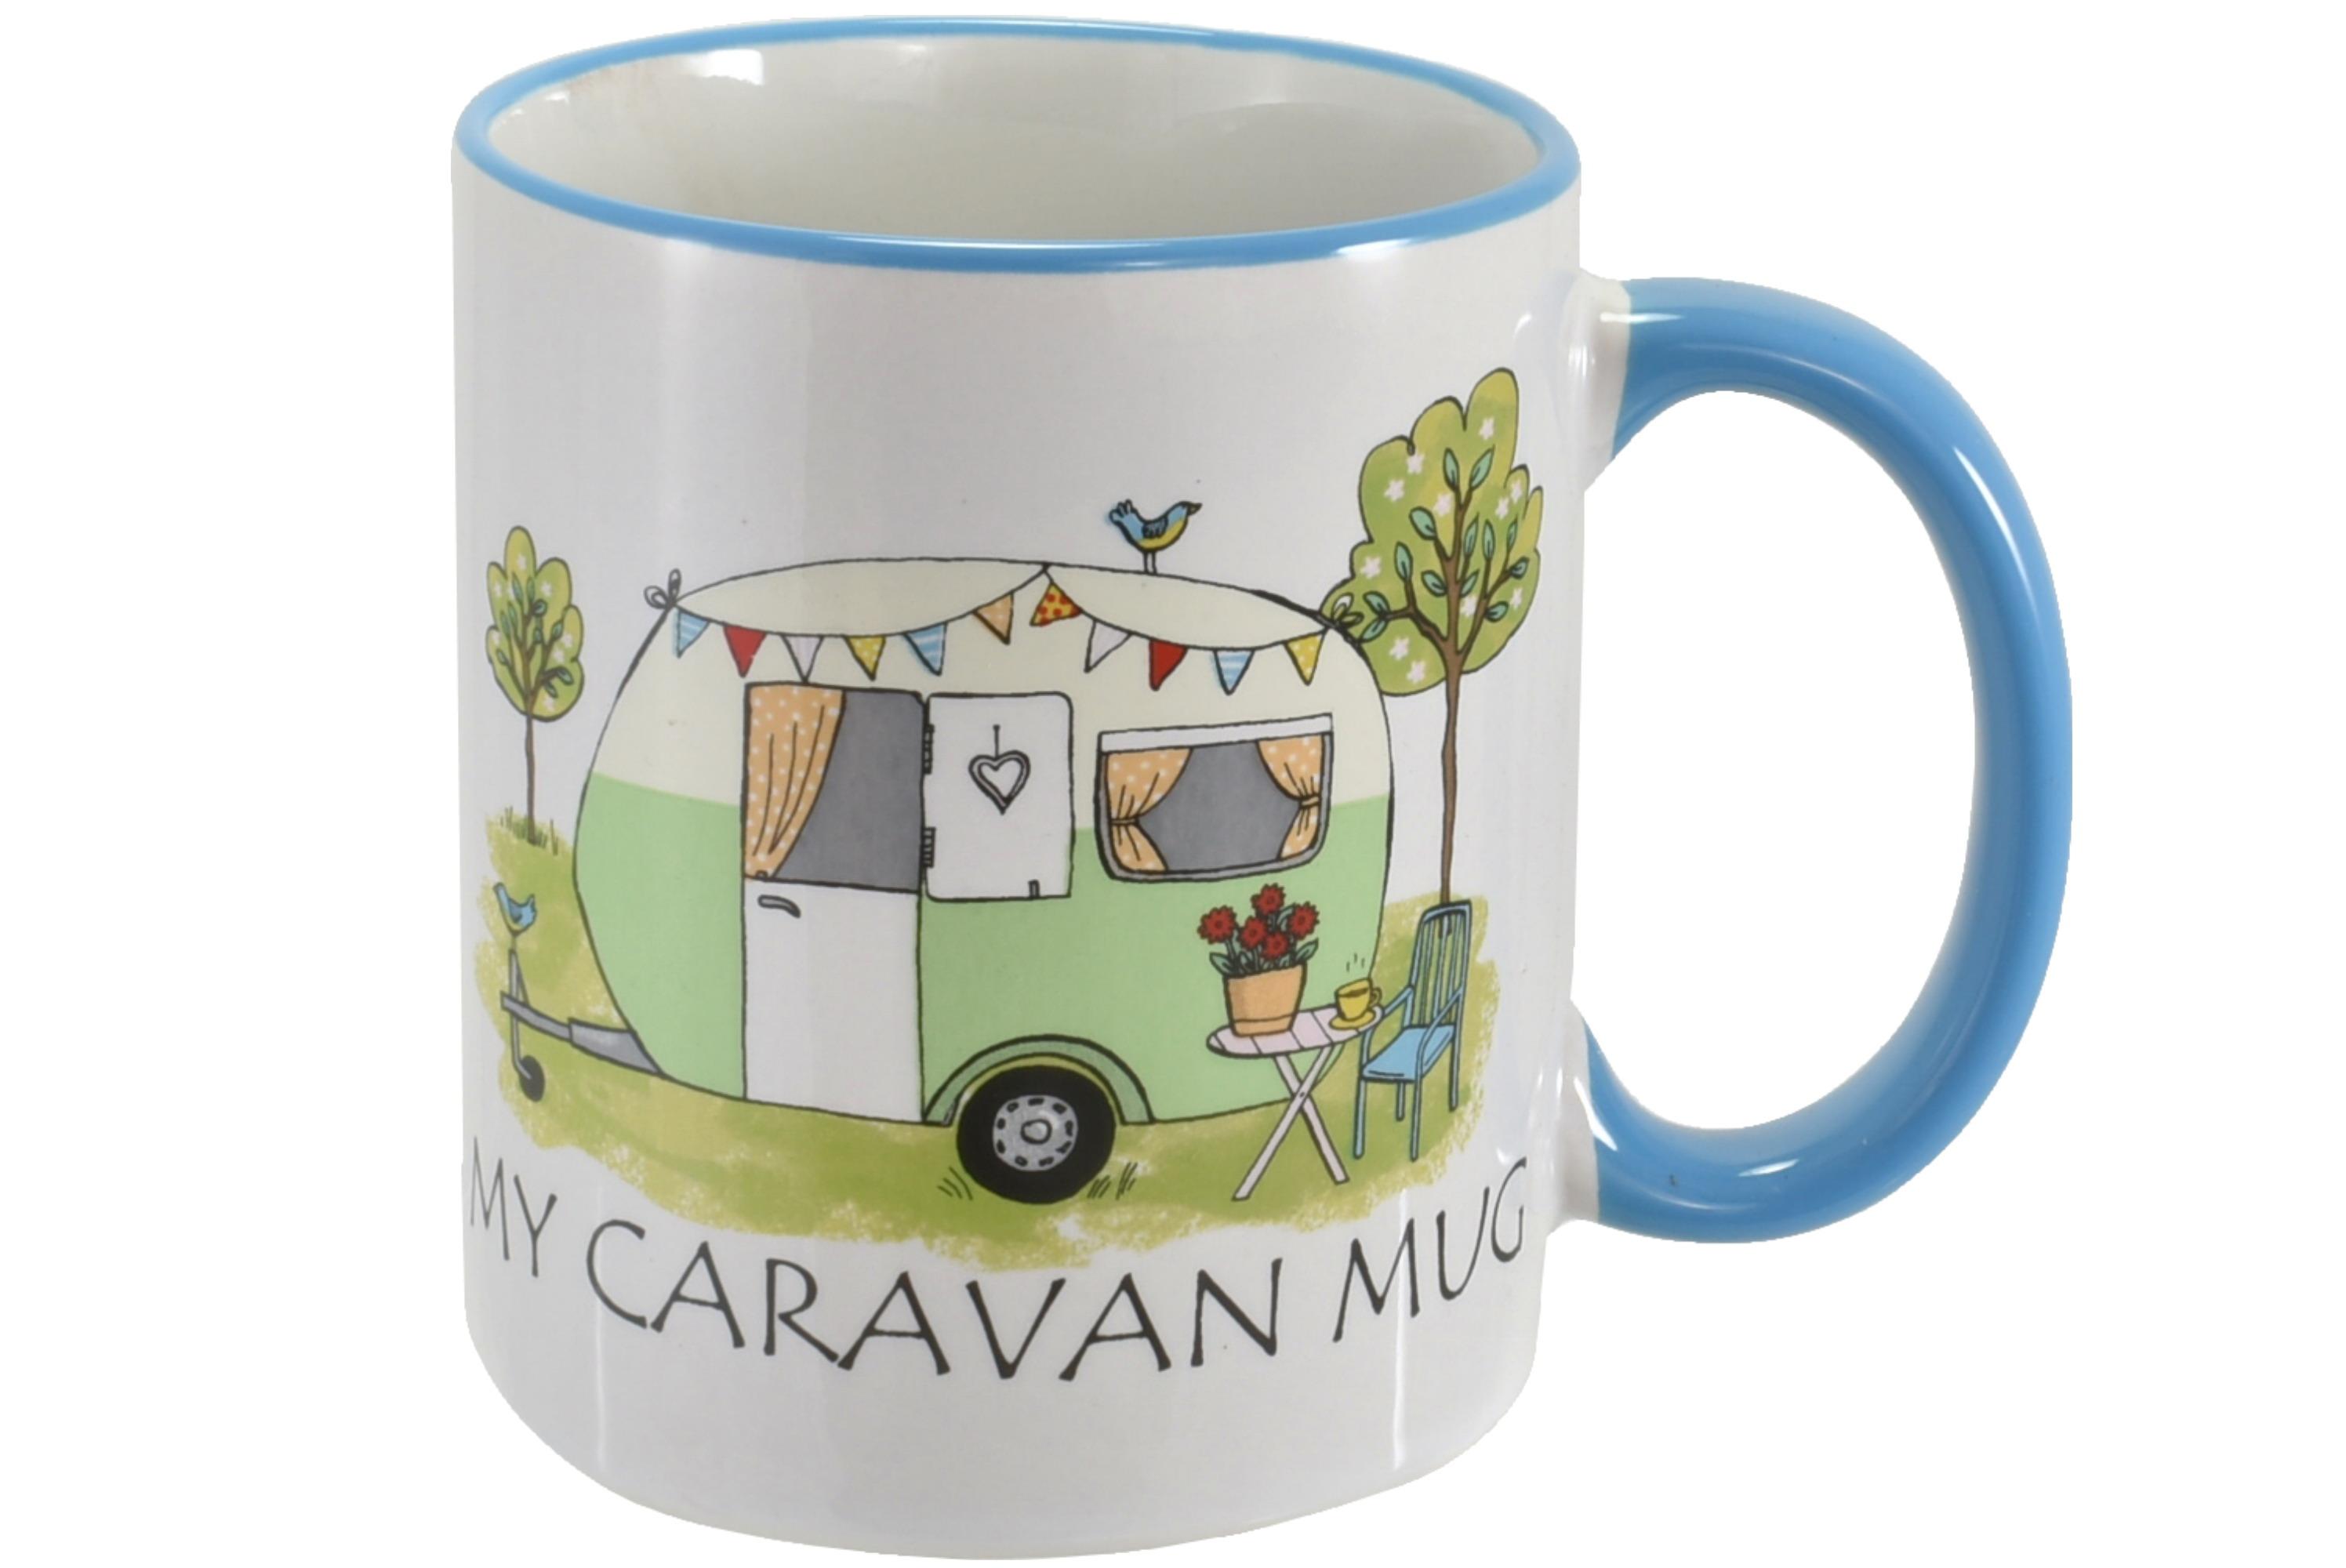 Caravan Mug Stoneware 10oz